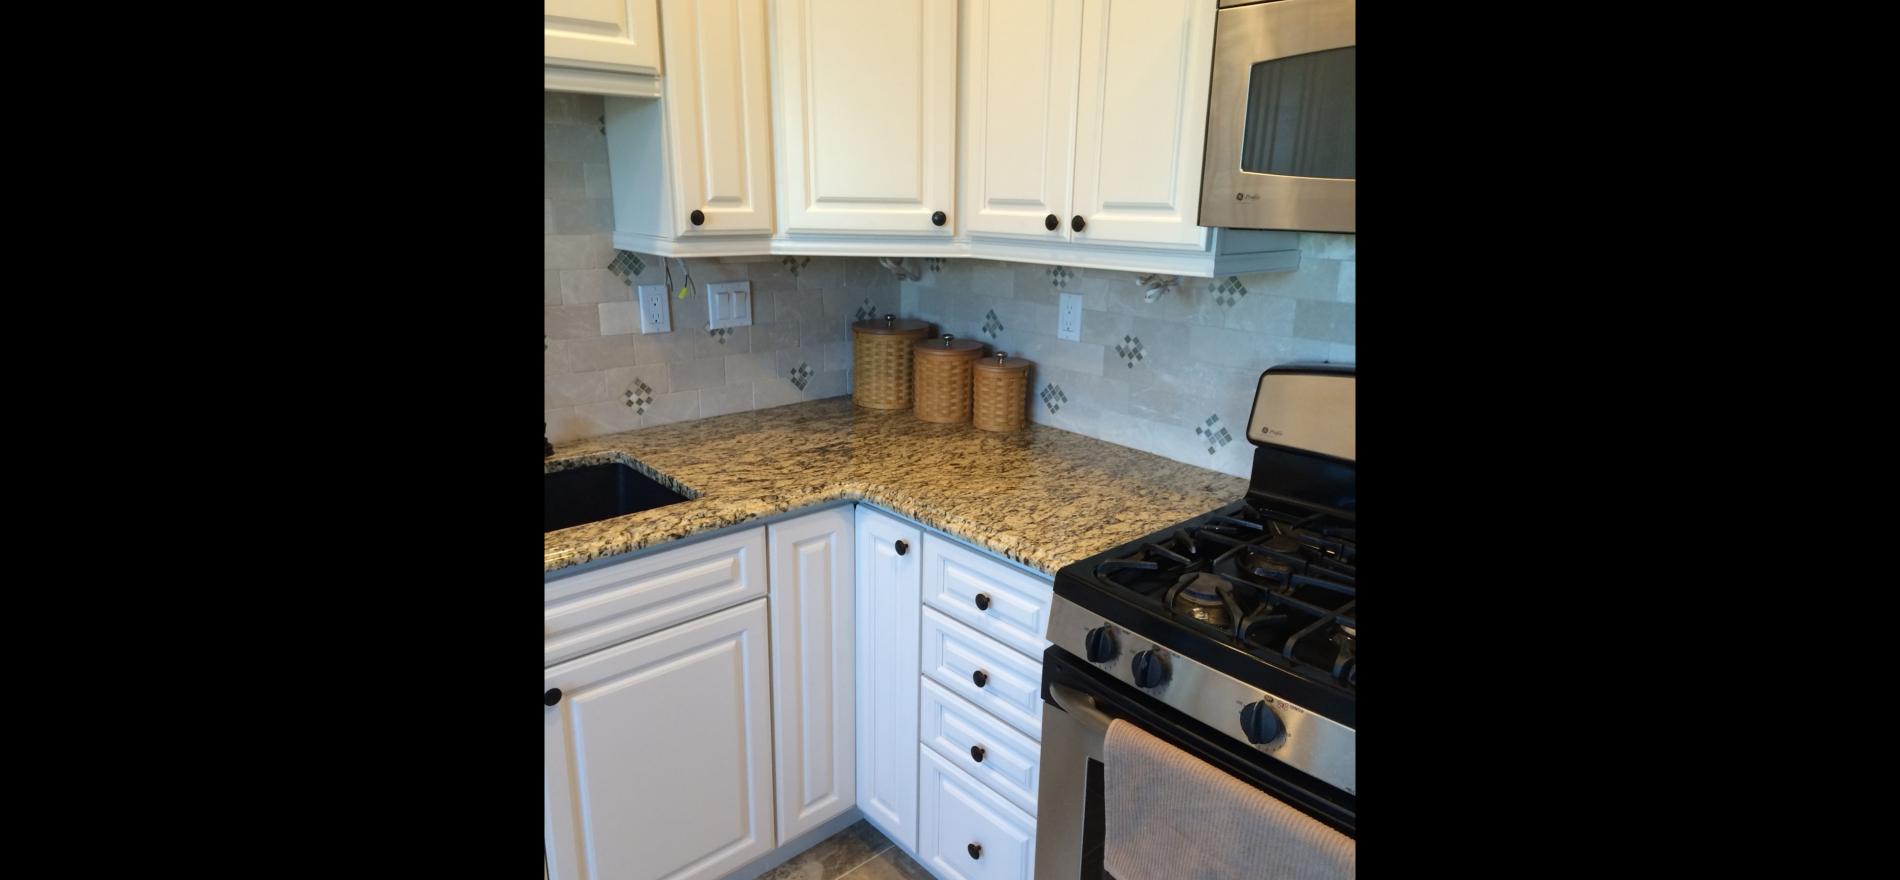 Kitchens14 Kitchen Remodel Photos